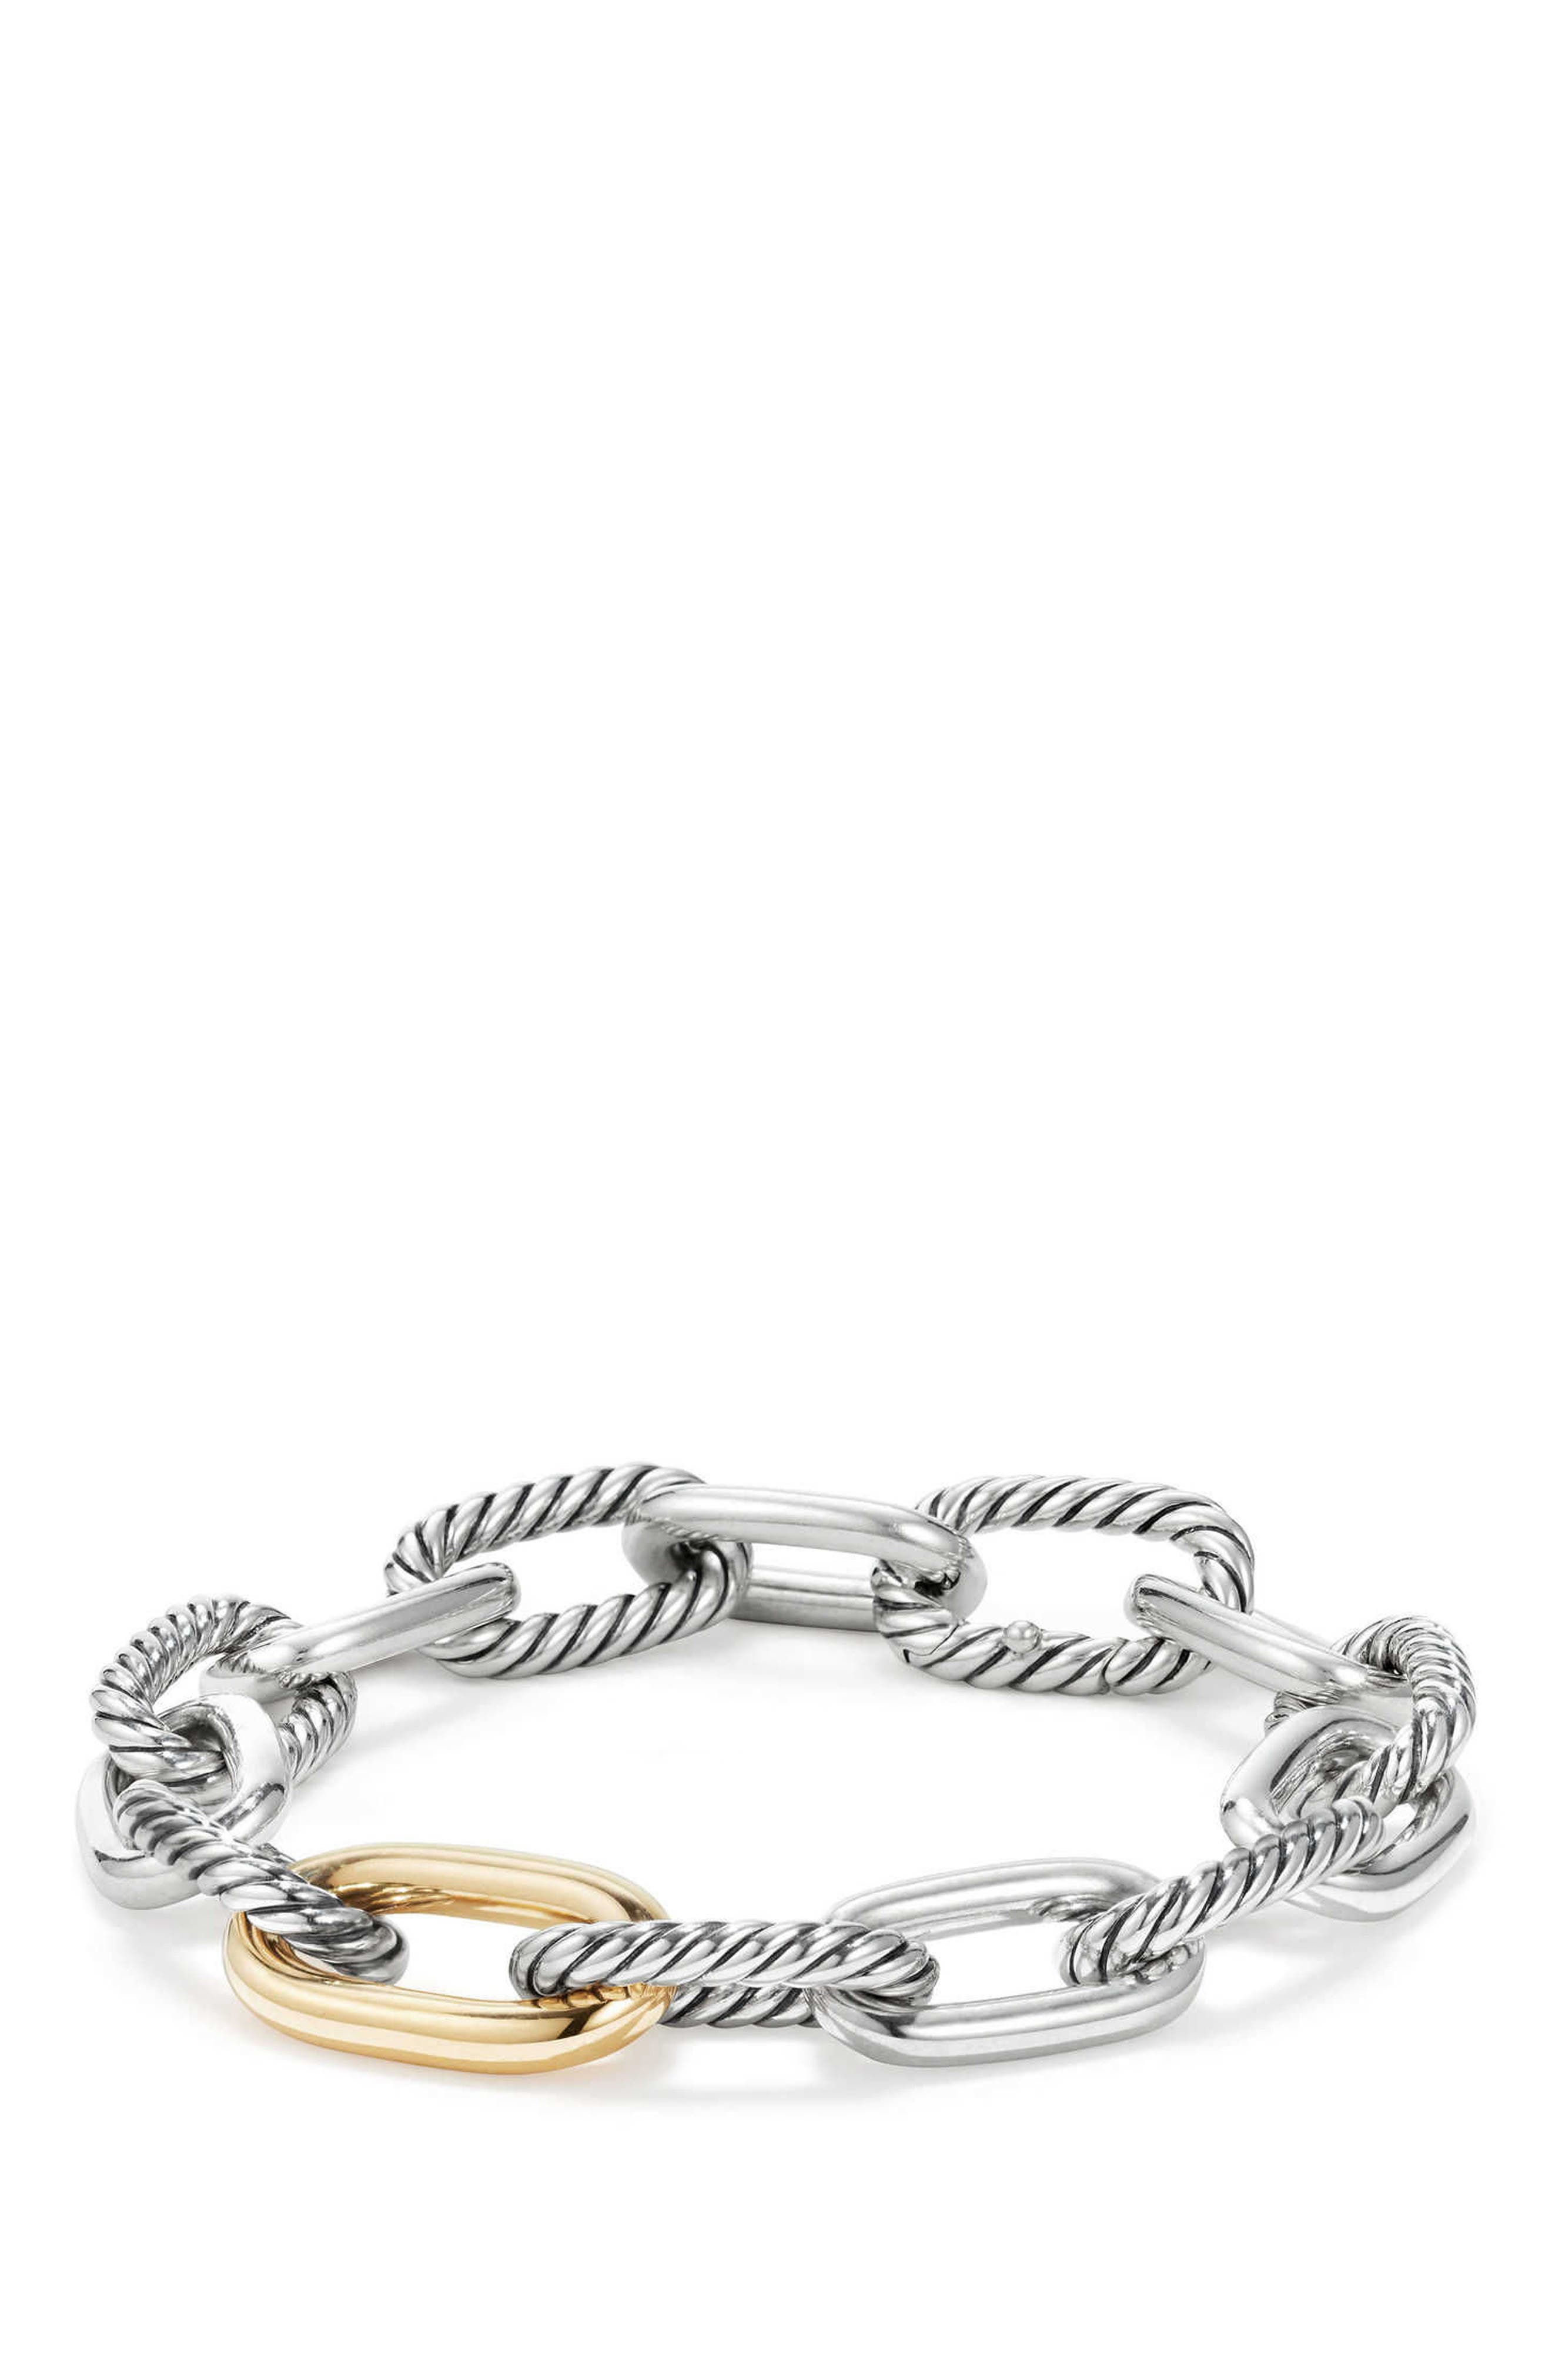 DAVID YURMAN, DY Madison Chain Medium Bracelet, Main thumbnail 1, color, GOLD/ SILVER